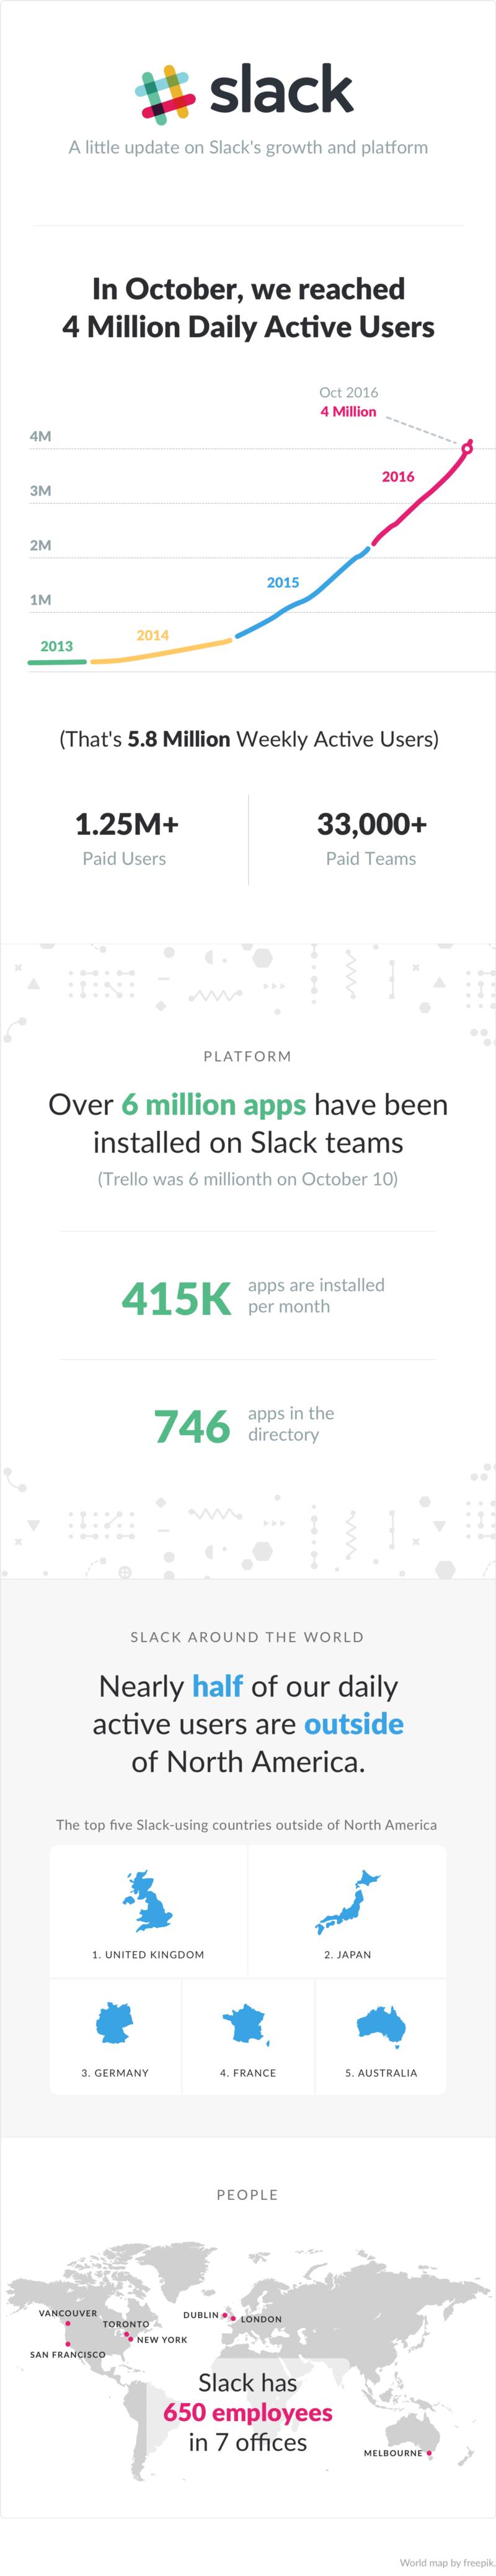 slack growth infographic